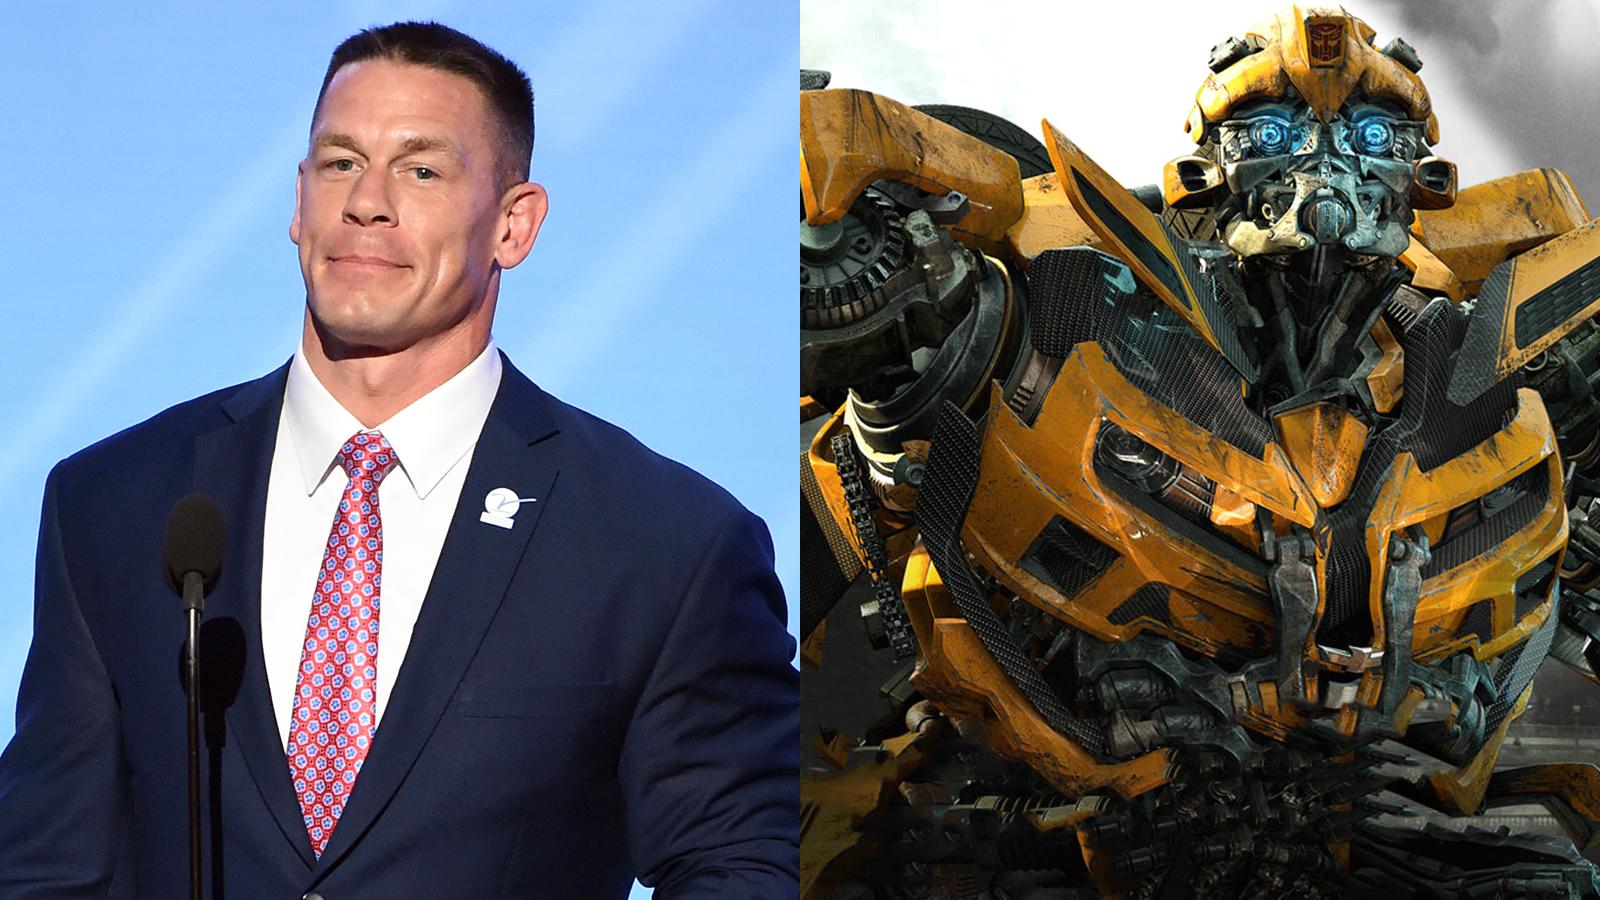 John Cena Transformers Bumblebee